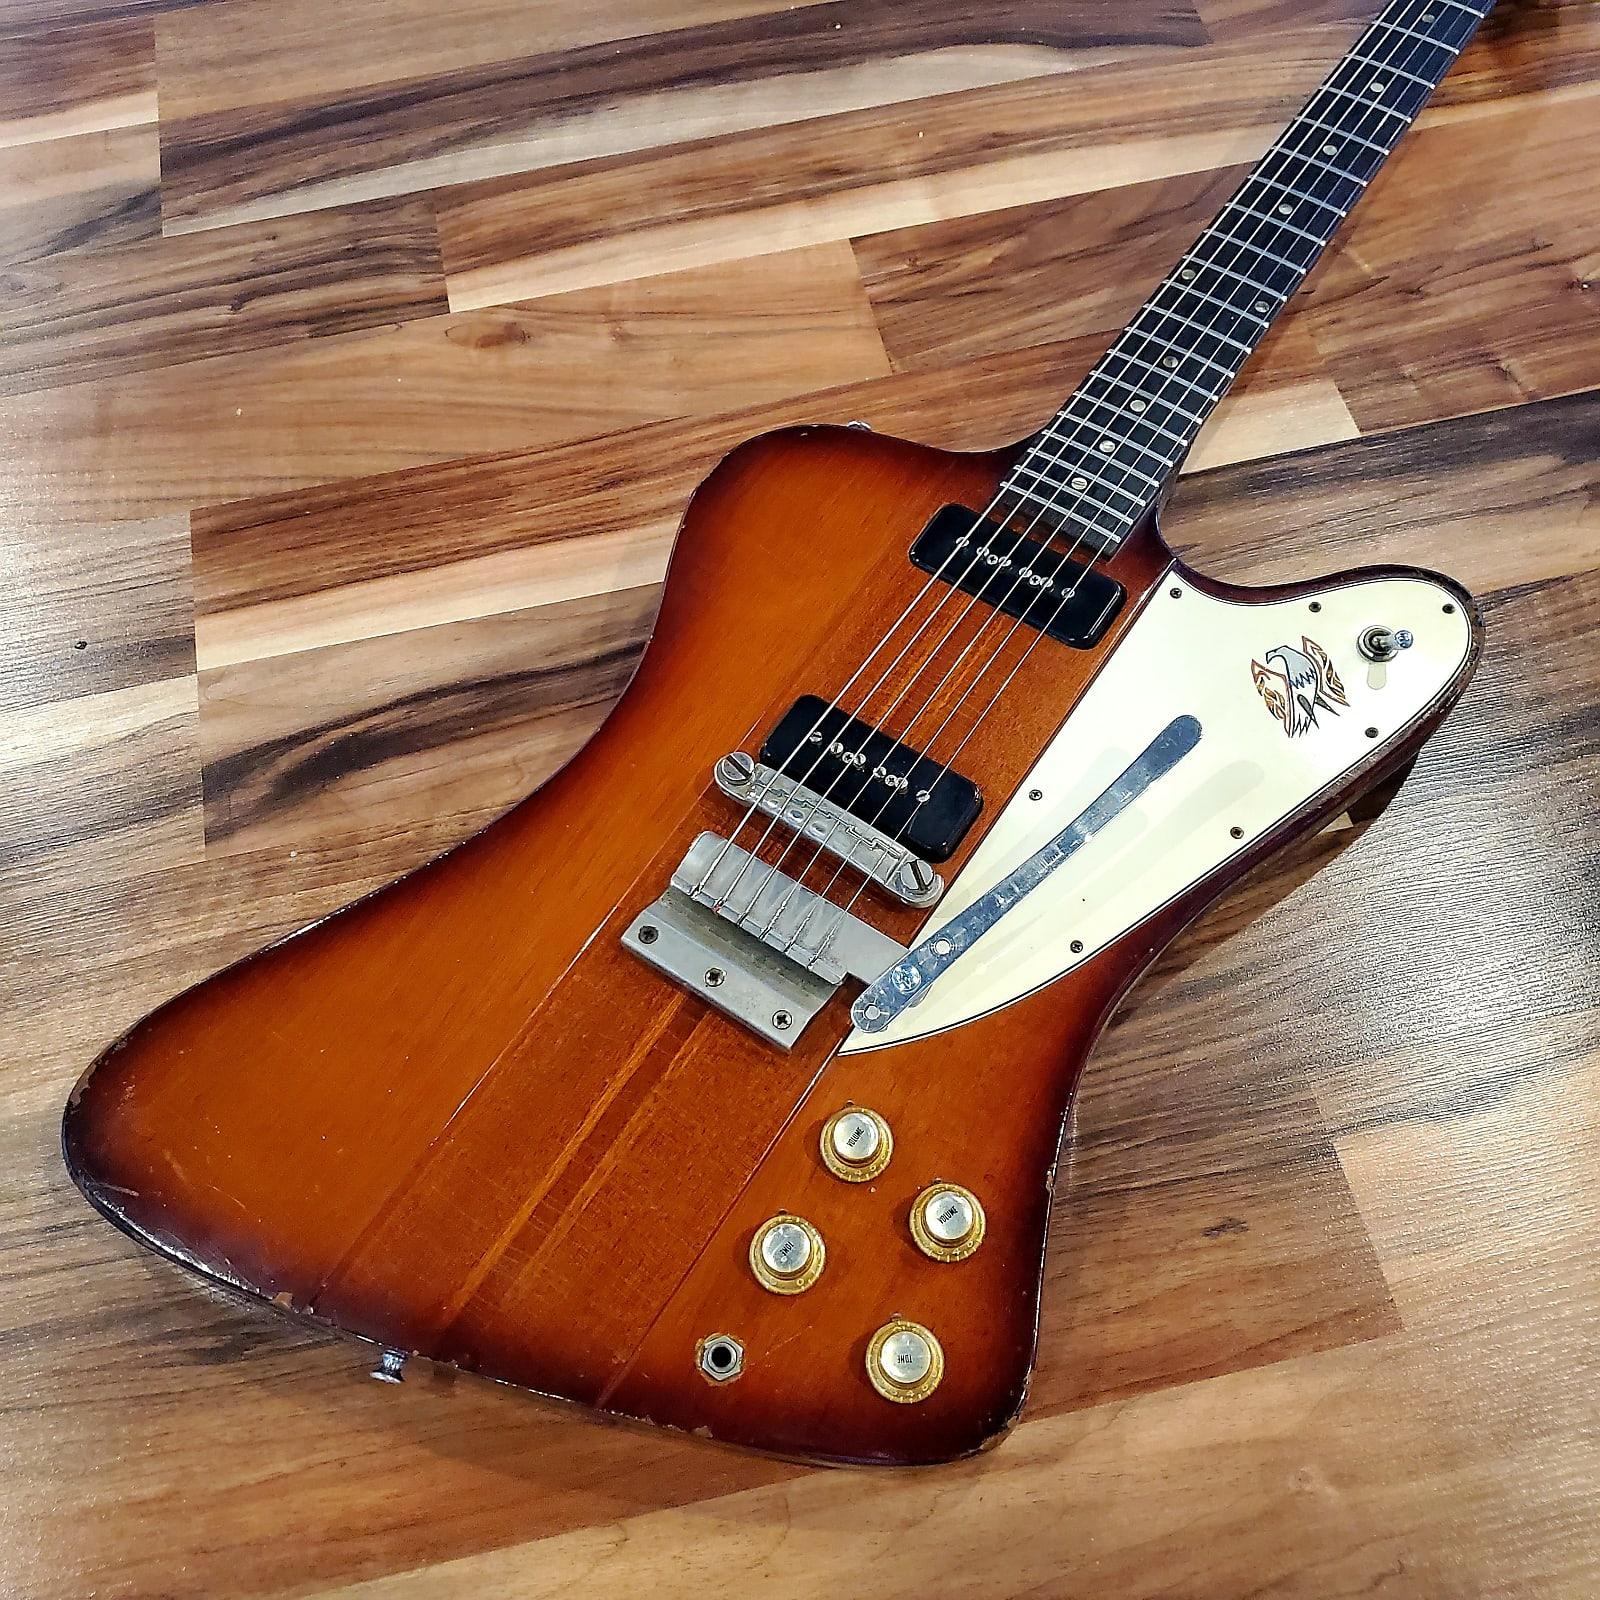 "1965 Gibson Firebird III ""Transition"" Model - Reverse Body P90"